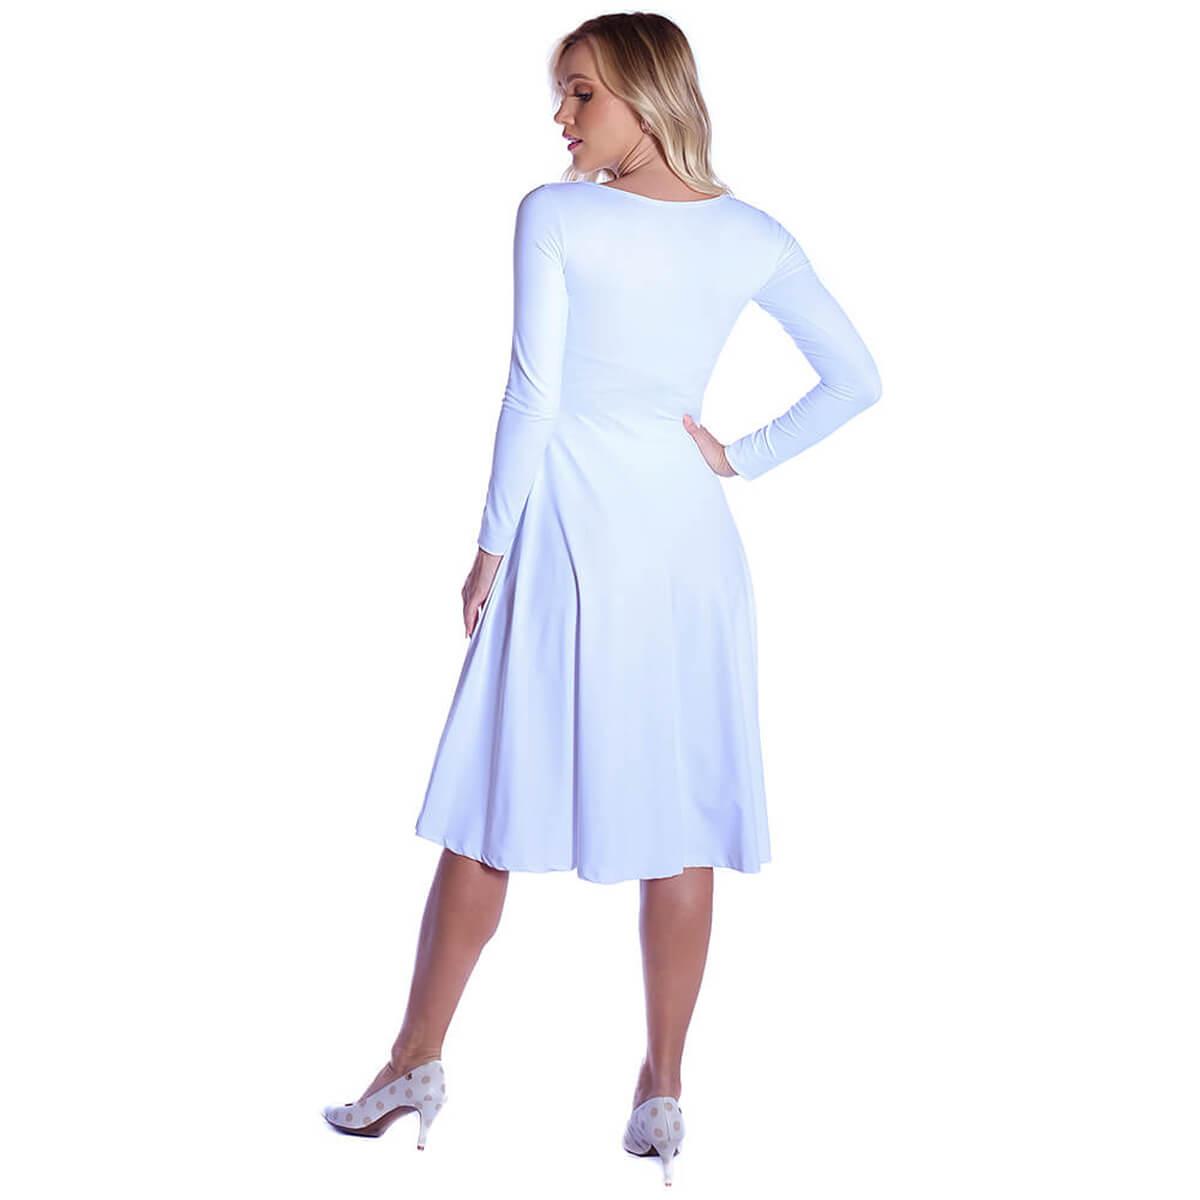 Vestido Branco Manga Longa Decote Redondo